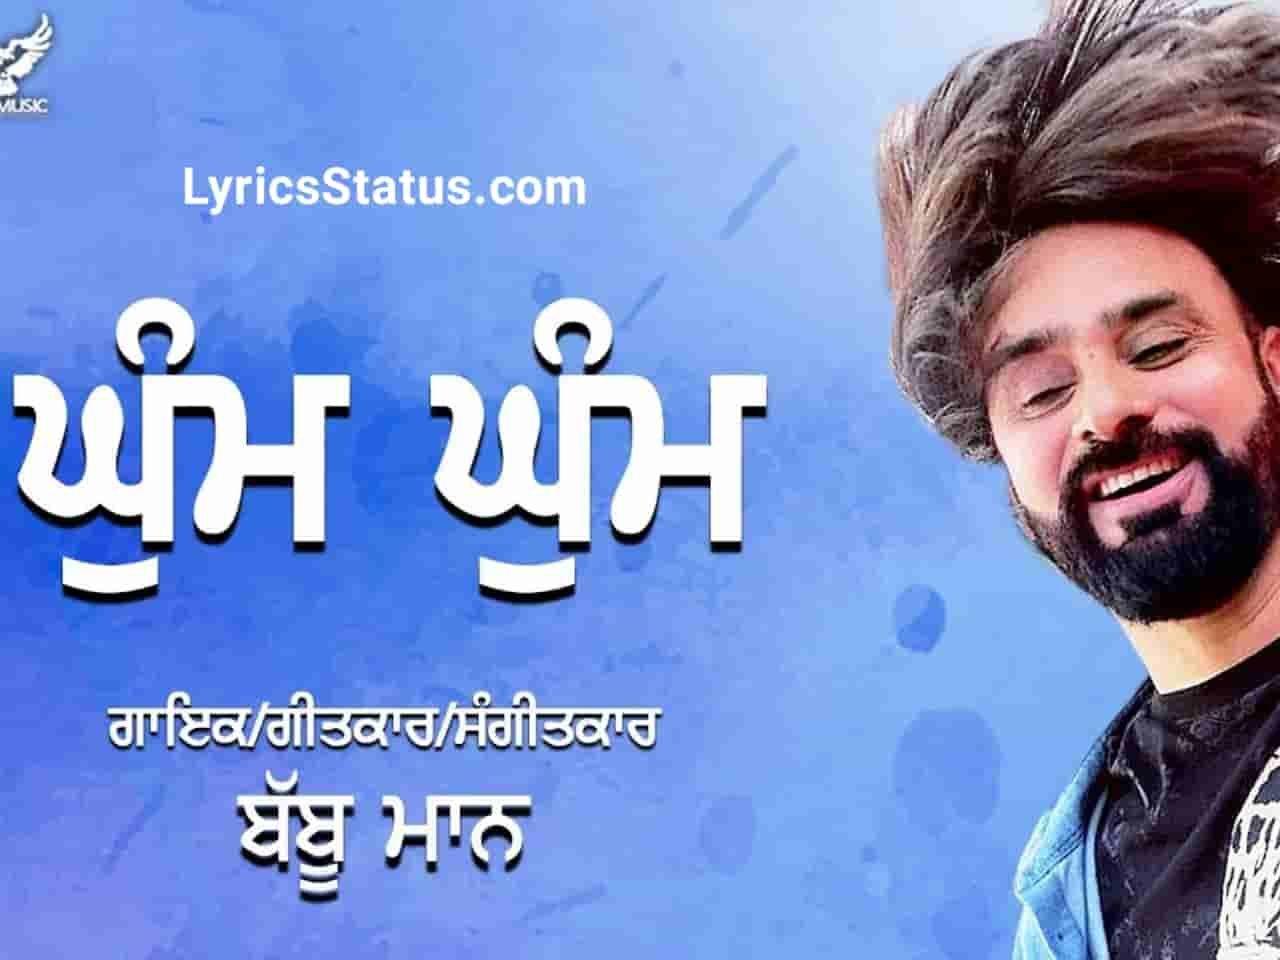 Babbu Maan Ghum Ghum Lyrics Status Download Punjabi song Ghum Ghum Nachdi Shokeen Jattiye Ni Munda Ghum Ke Boliyan Paave status video